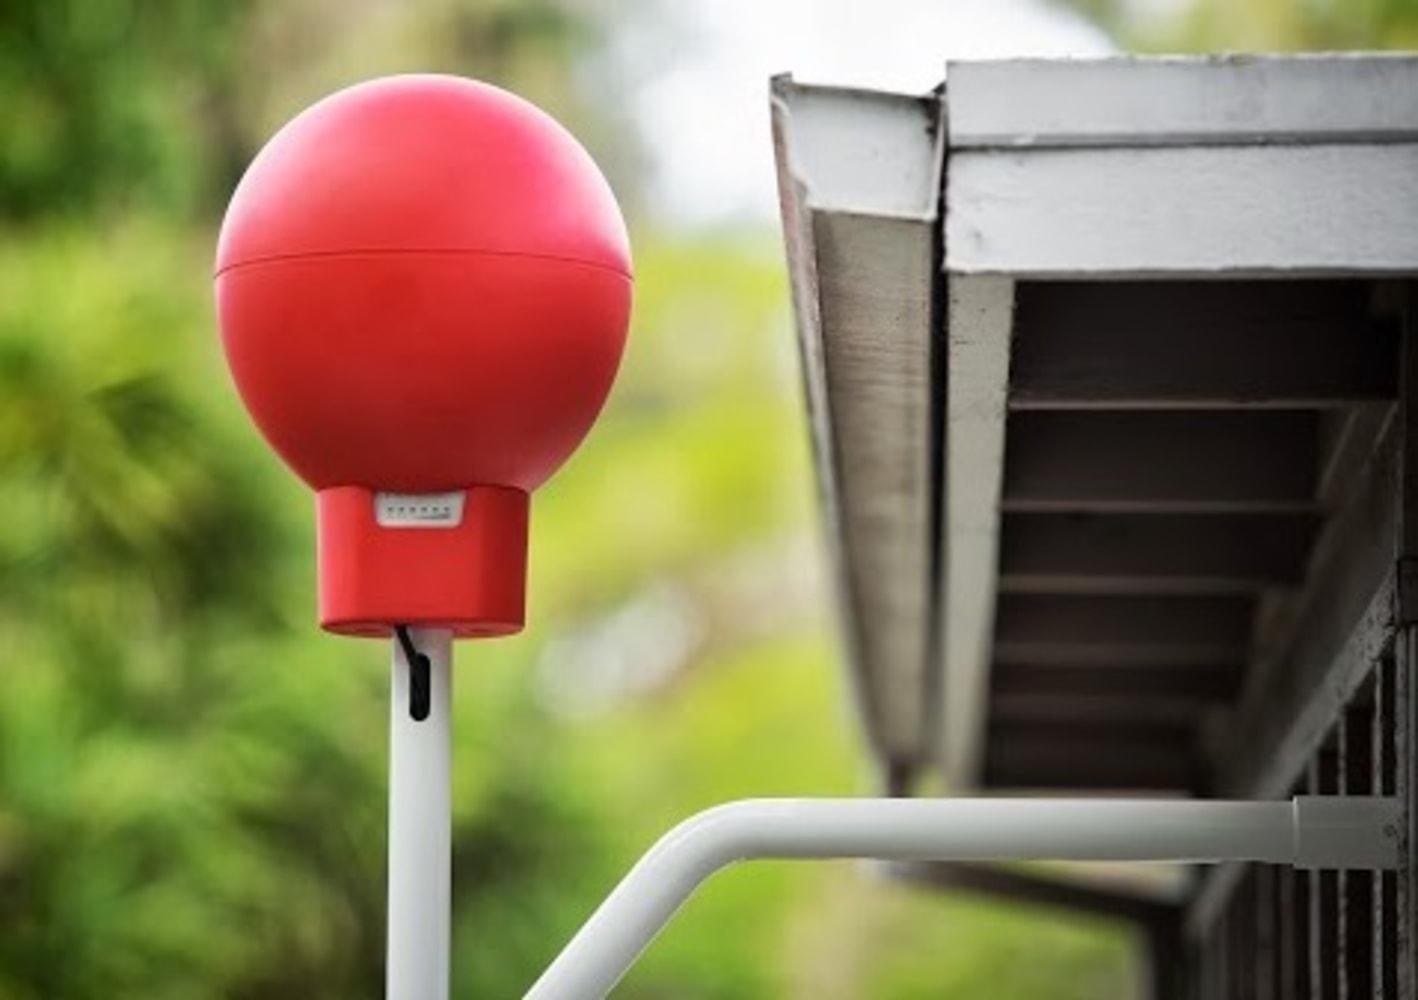 Google's Internet-beaming balloons get first volunteer testers